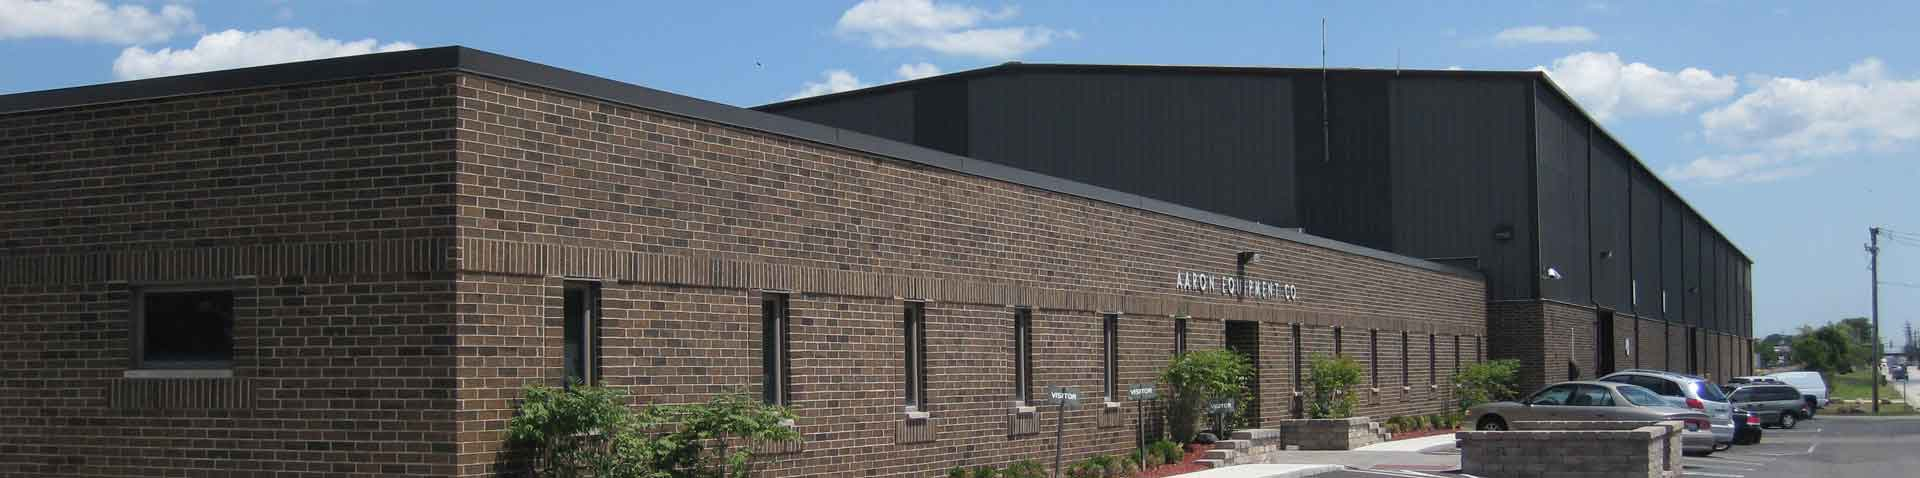 Aaron Equipment Company Headquarters